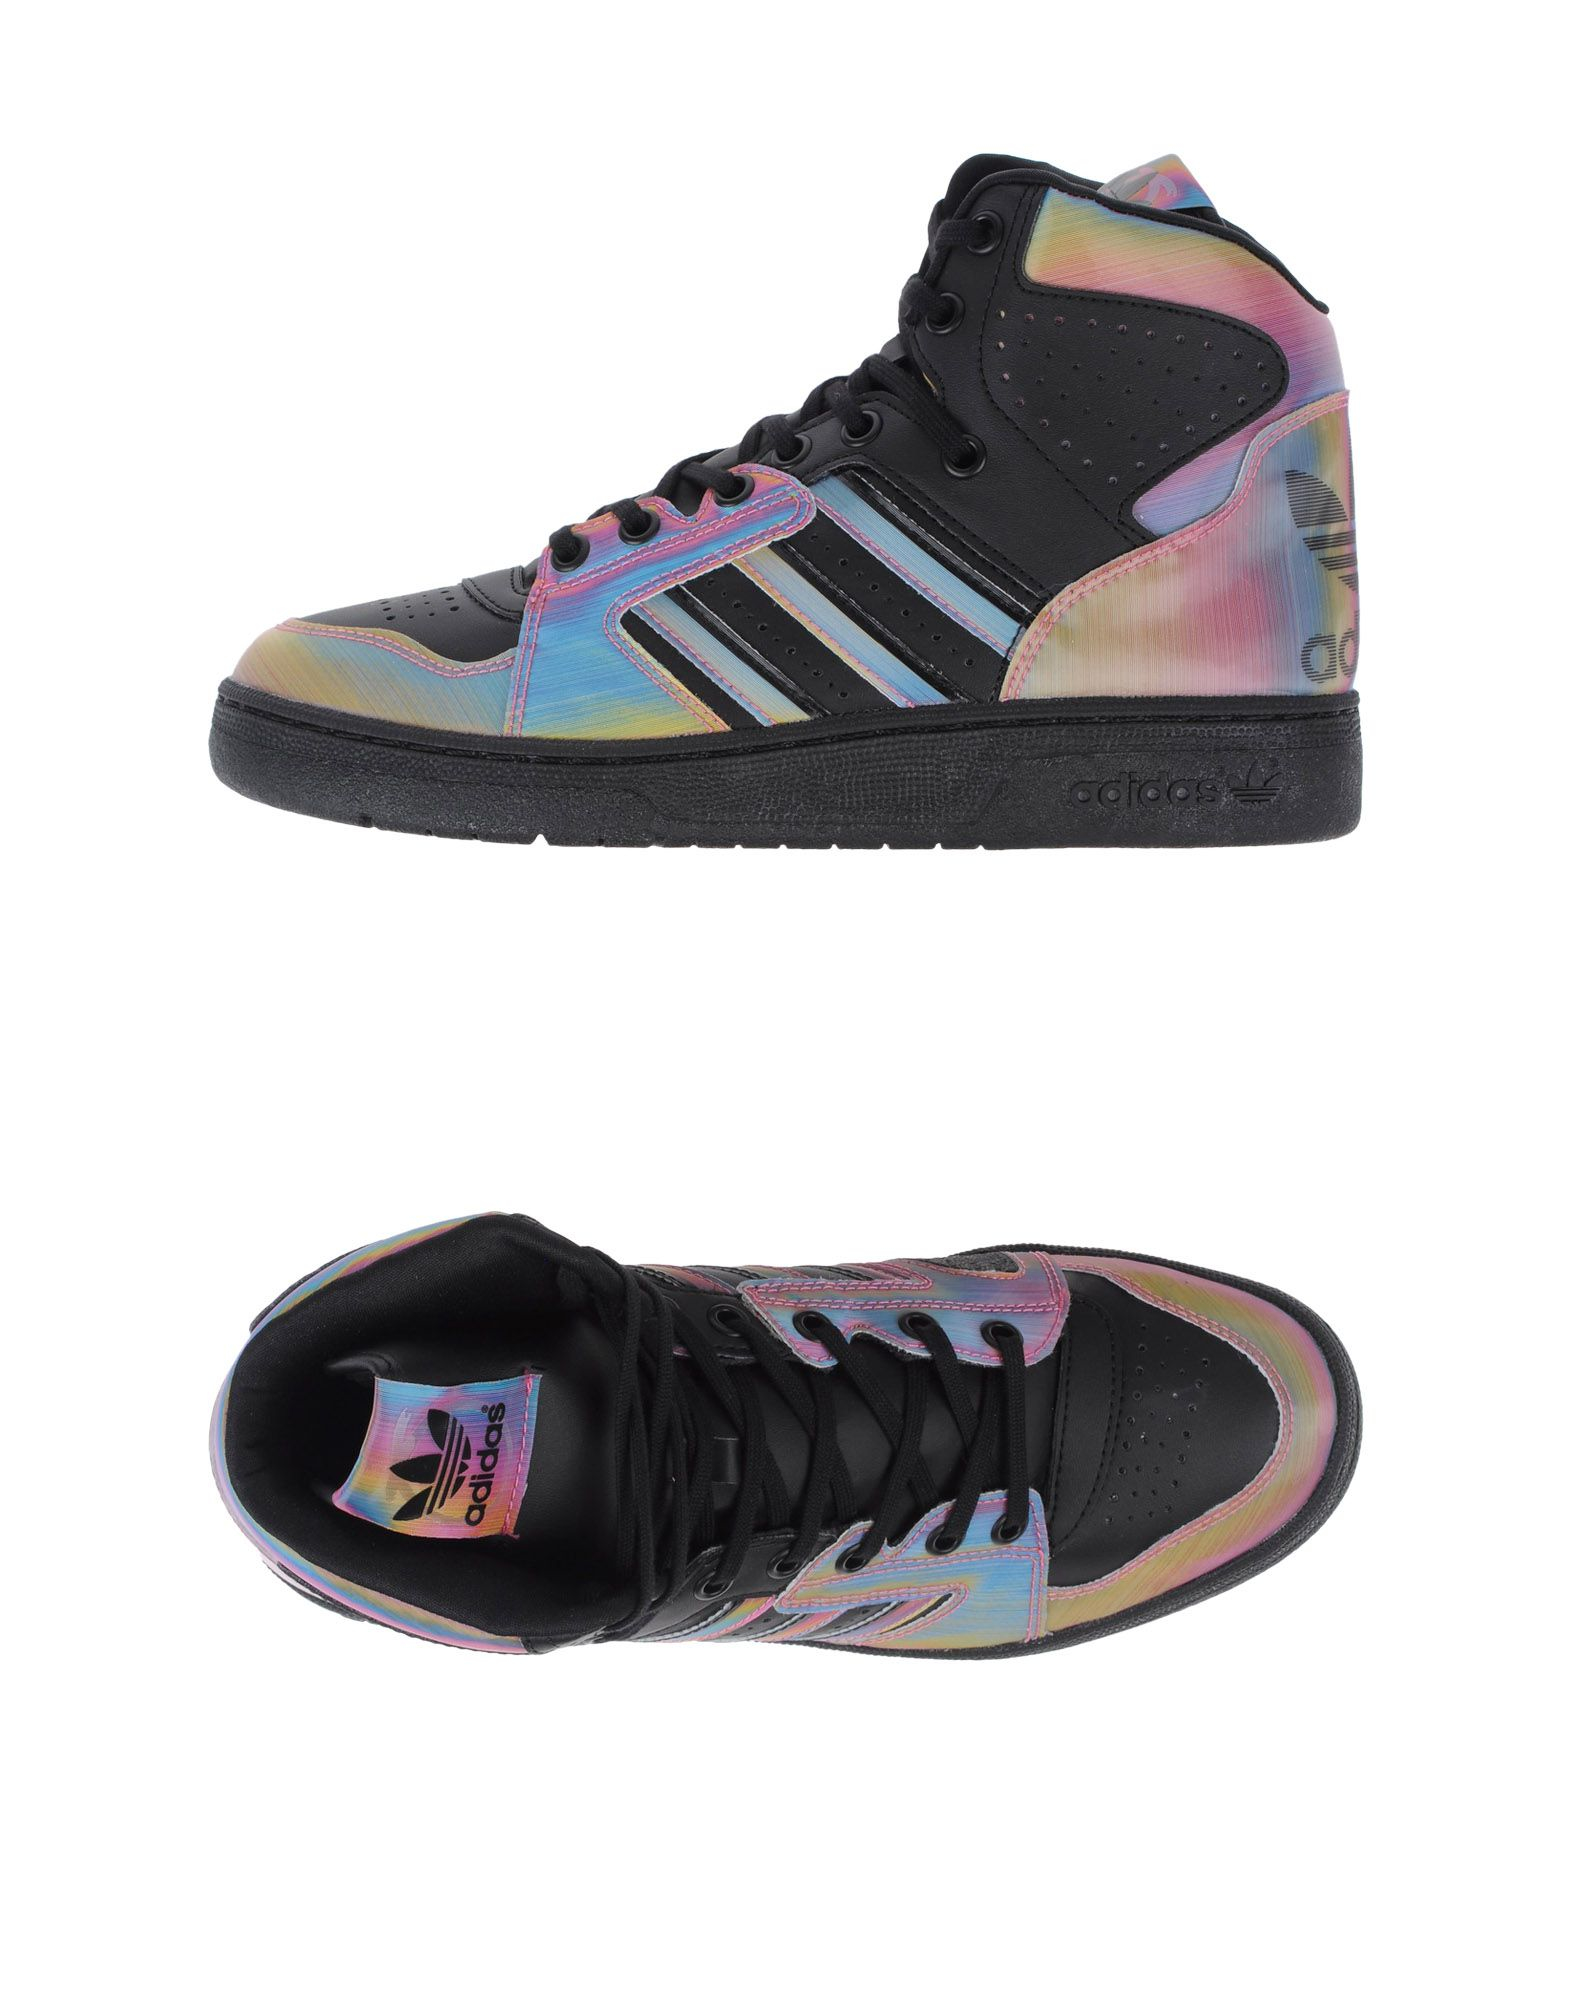 Rita Ora All Star Adidas Shoes